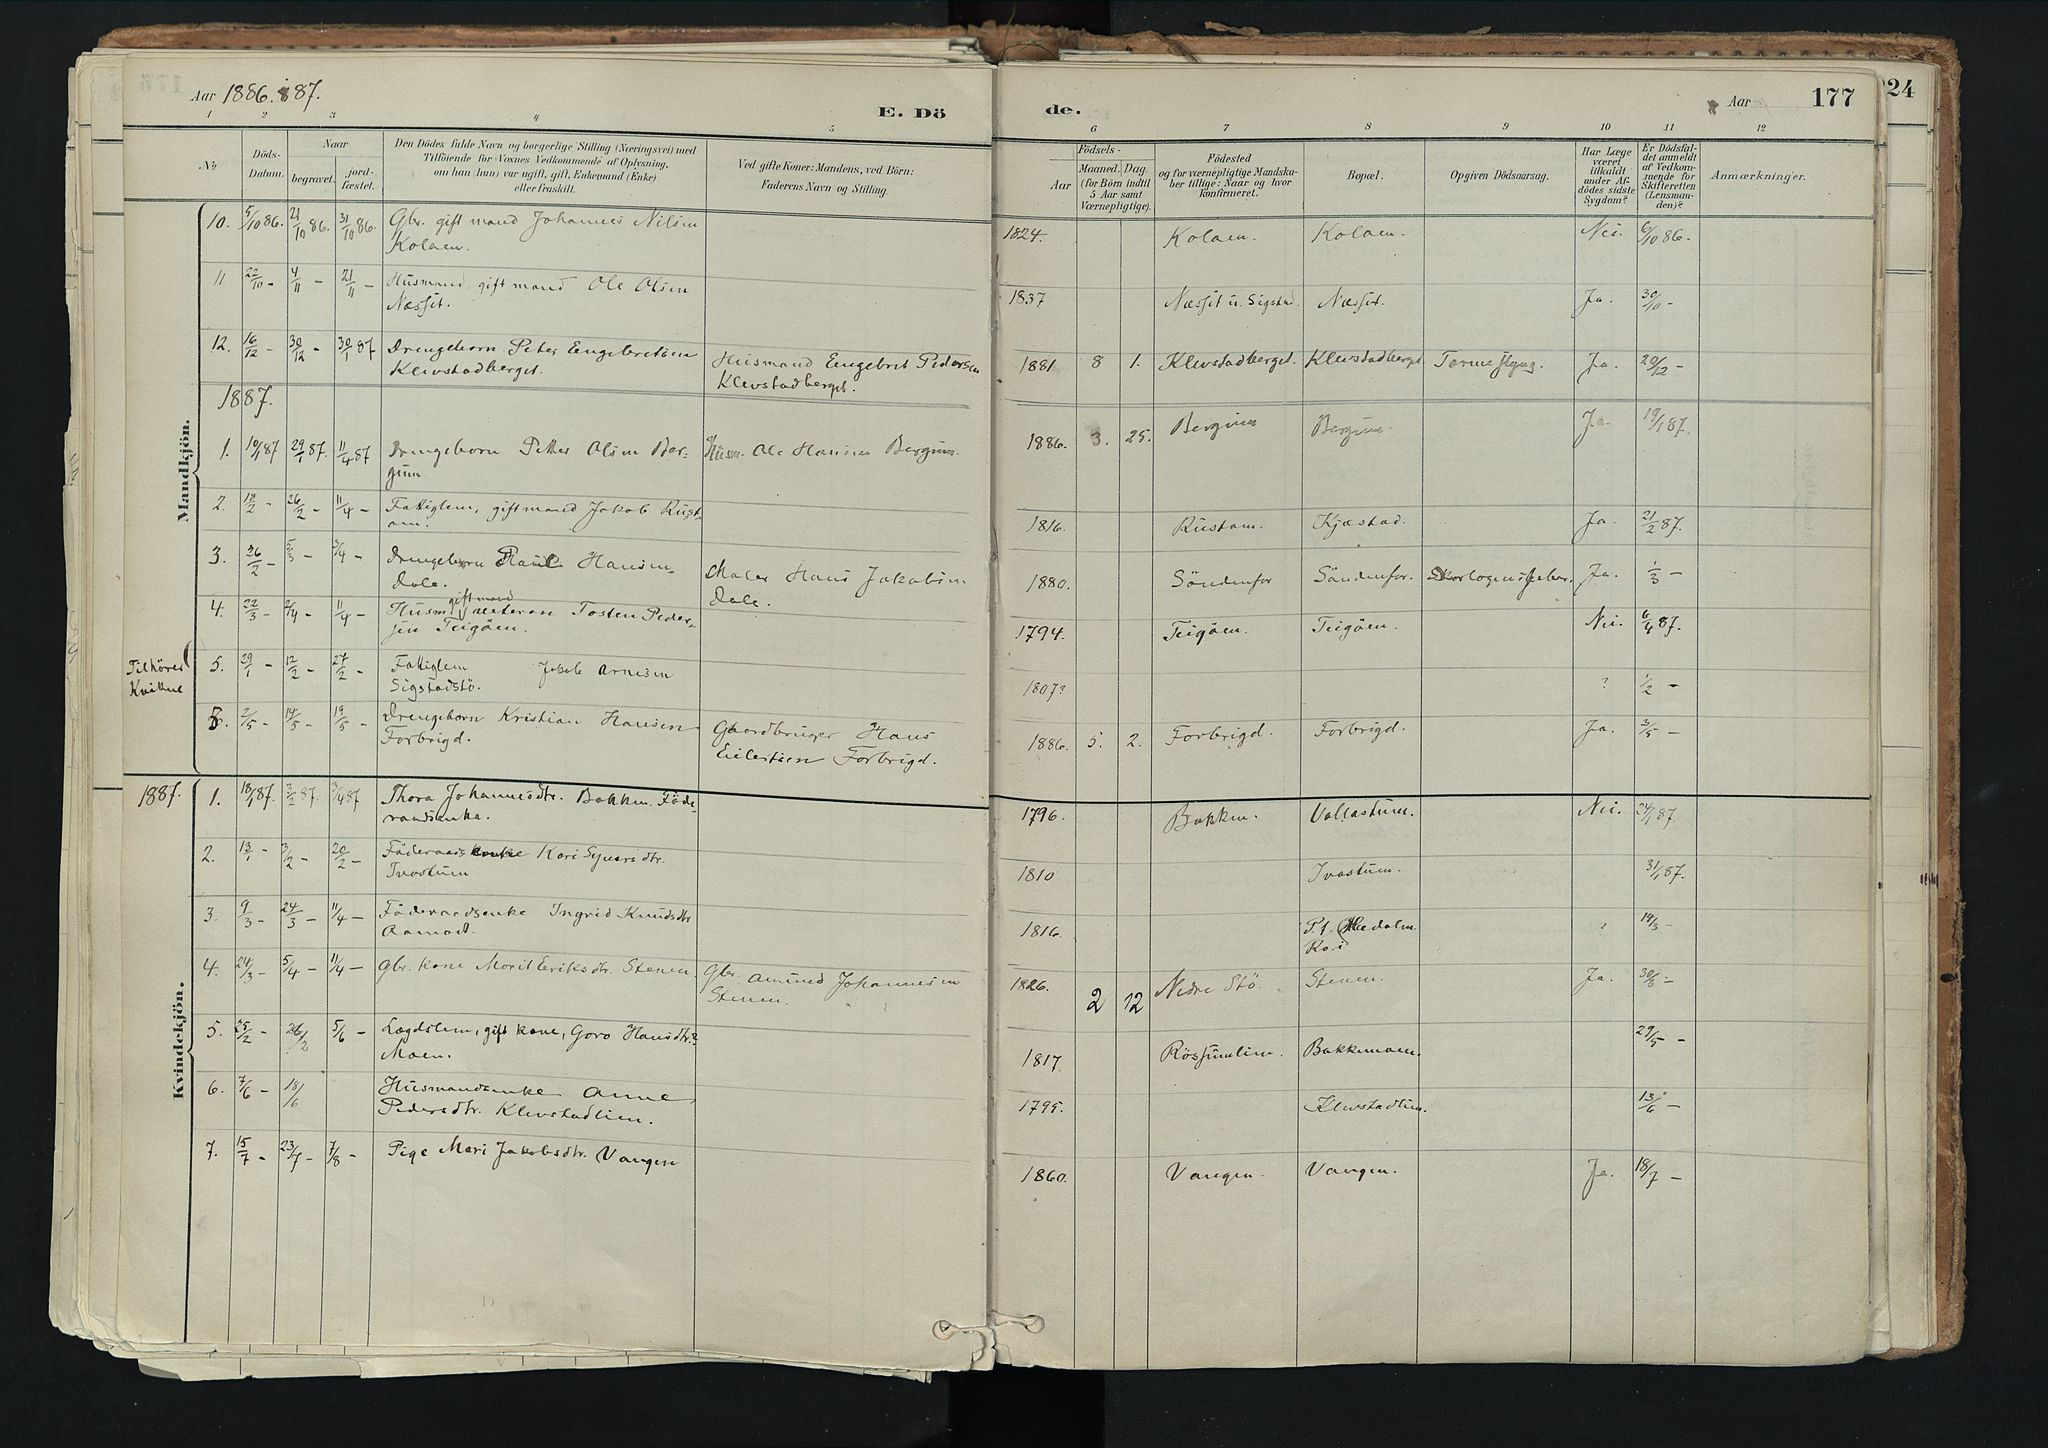 SAH, Nord-Fron prestekontor, Ministerialbok nr. 3, 1884-1914, s. 177